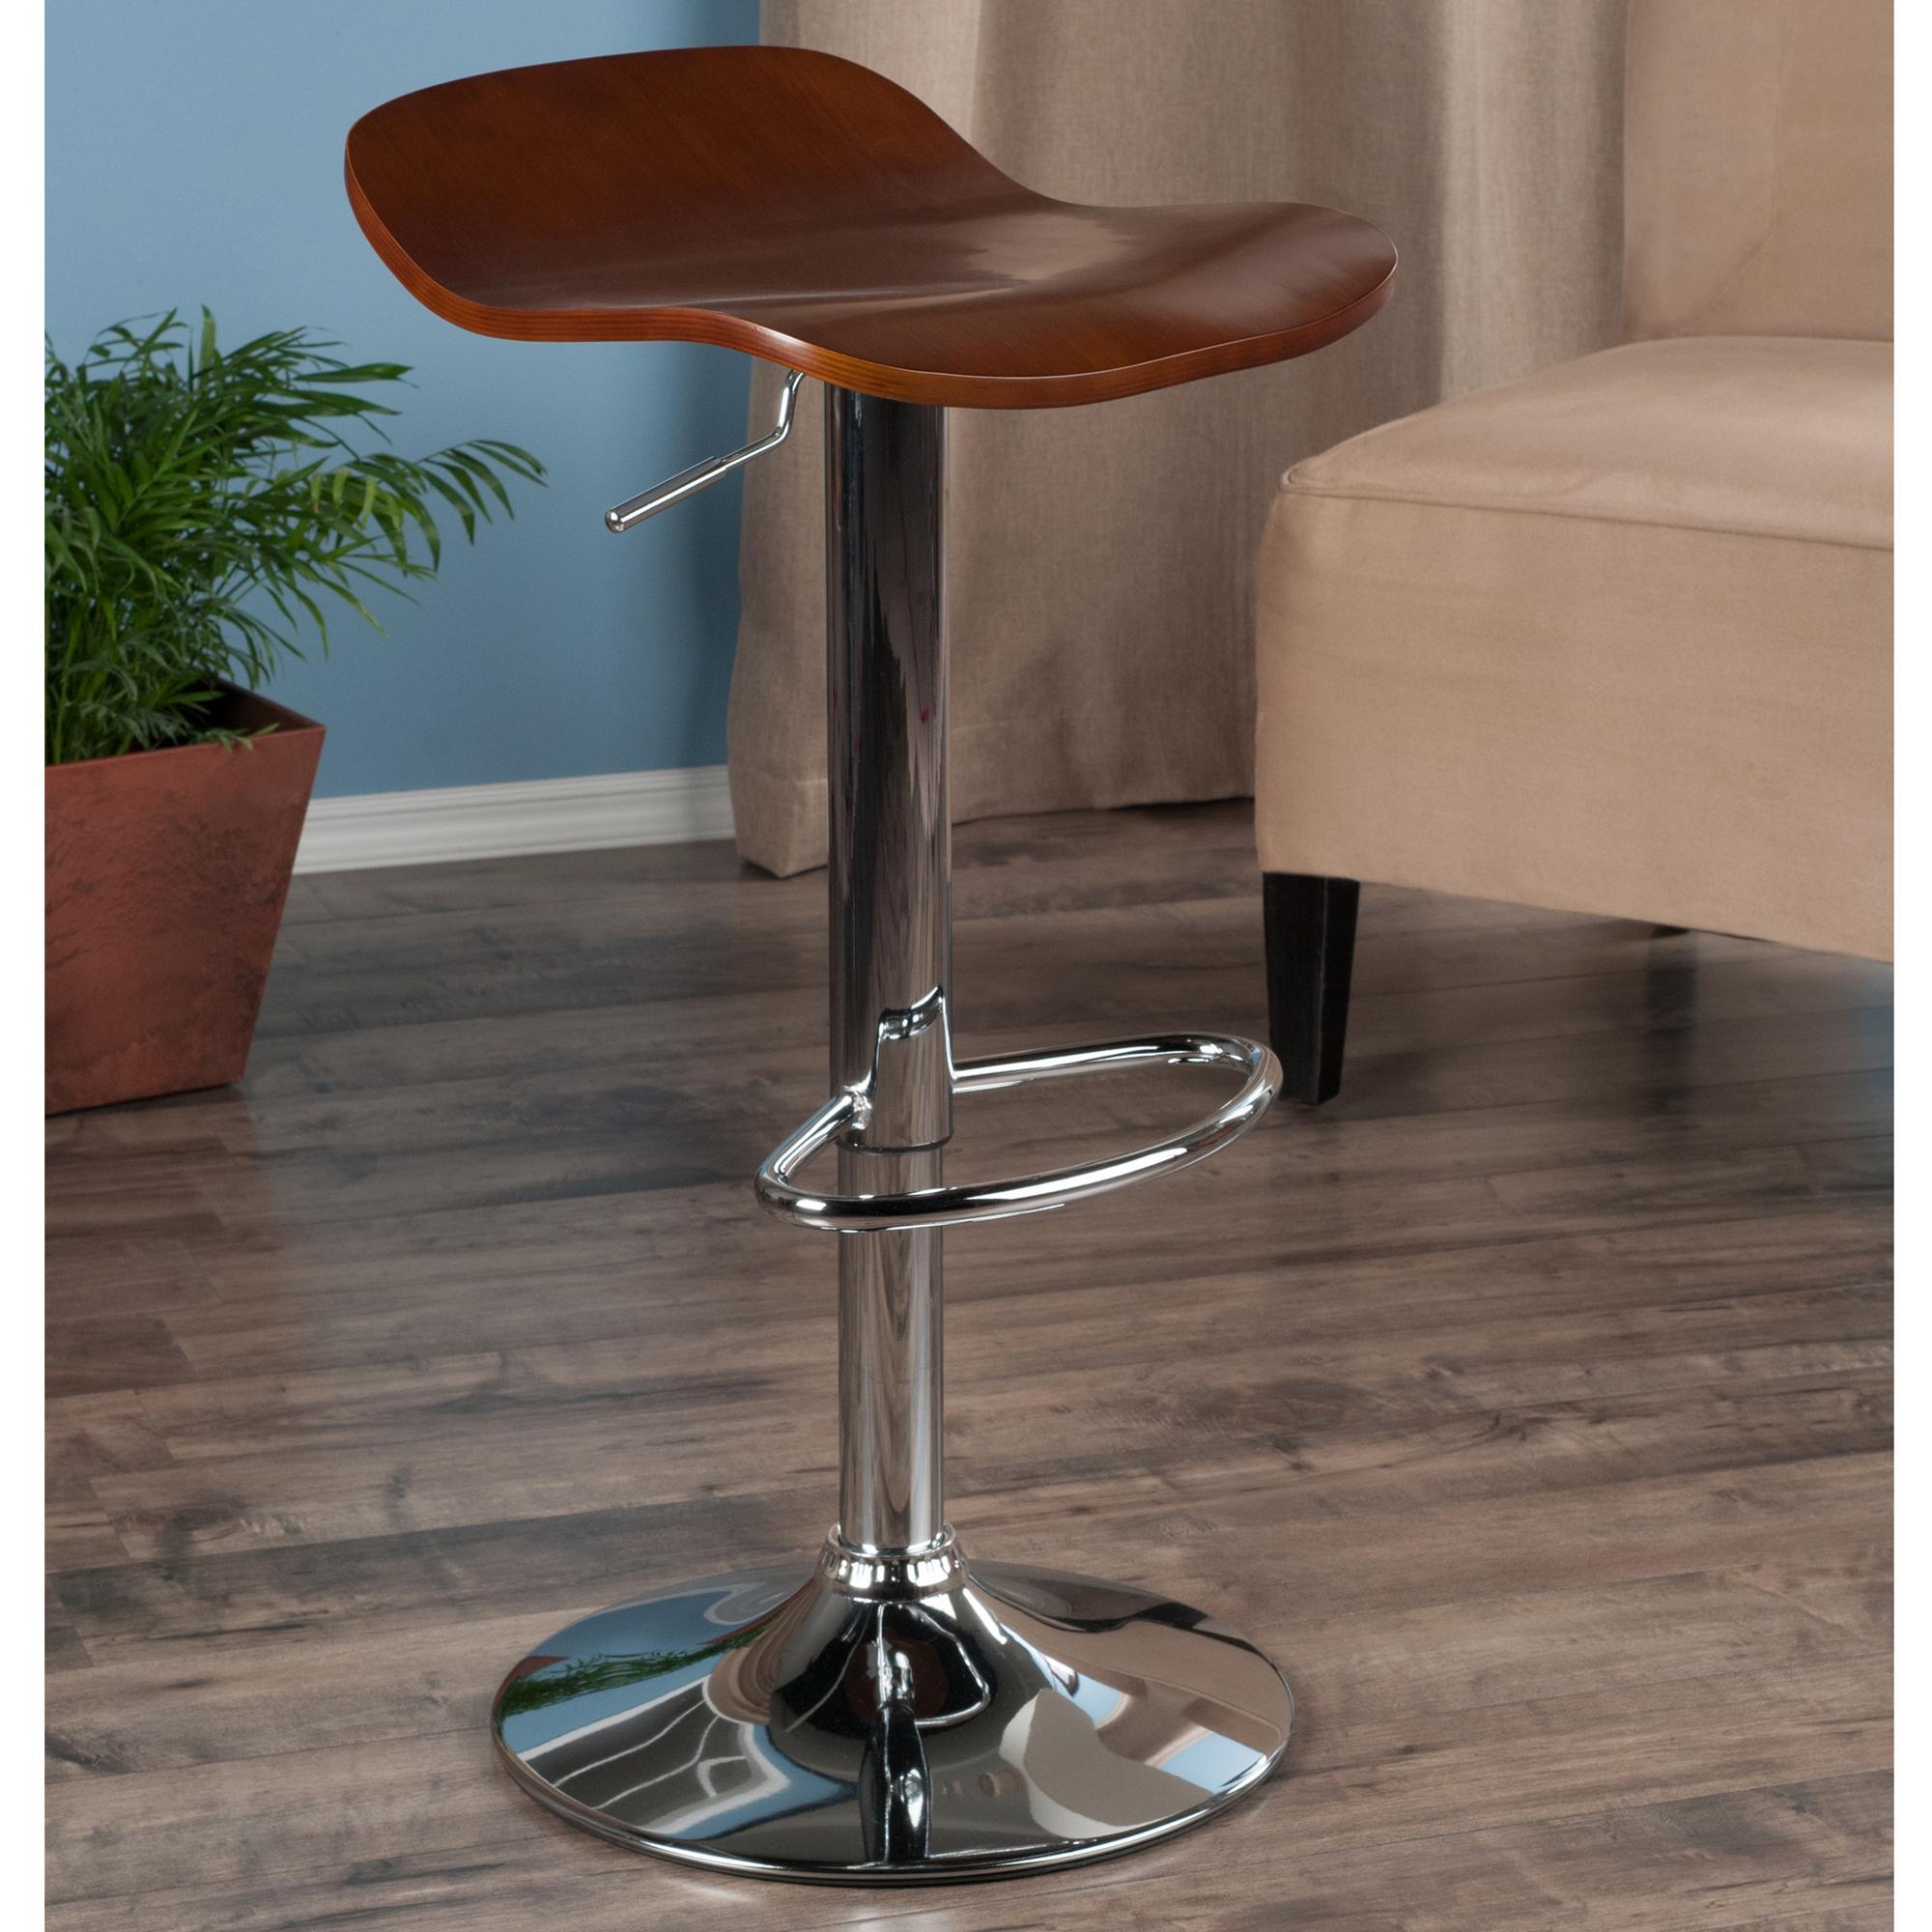 amazoncom winsome kallie air lift adjustable stools in wood  - kallie set of  air lift adjustable stool cappuccino wood veneer top andmetal